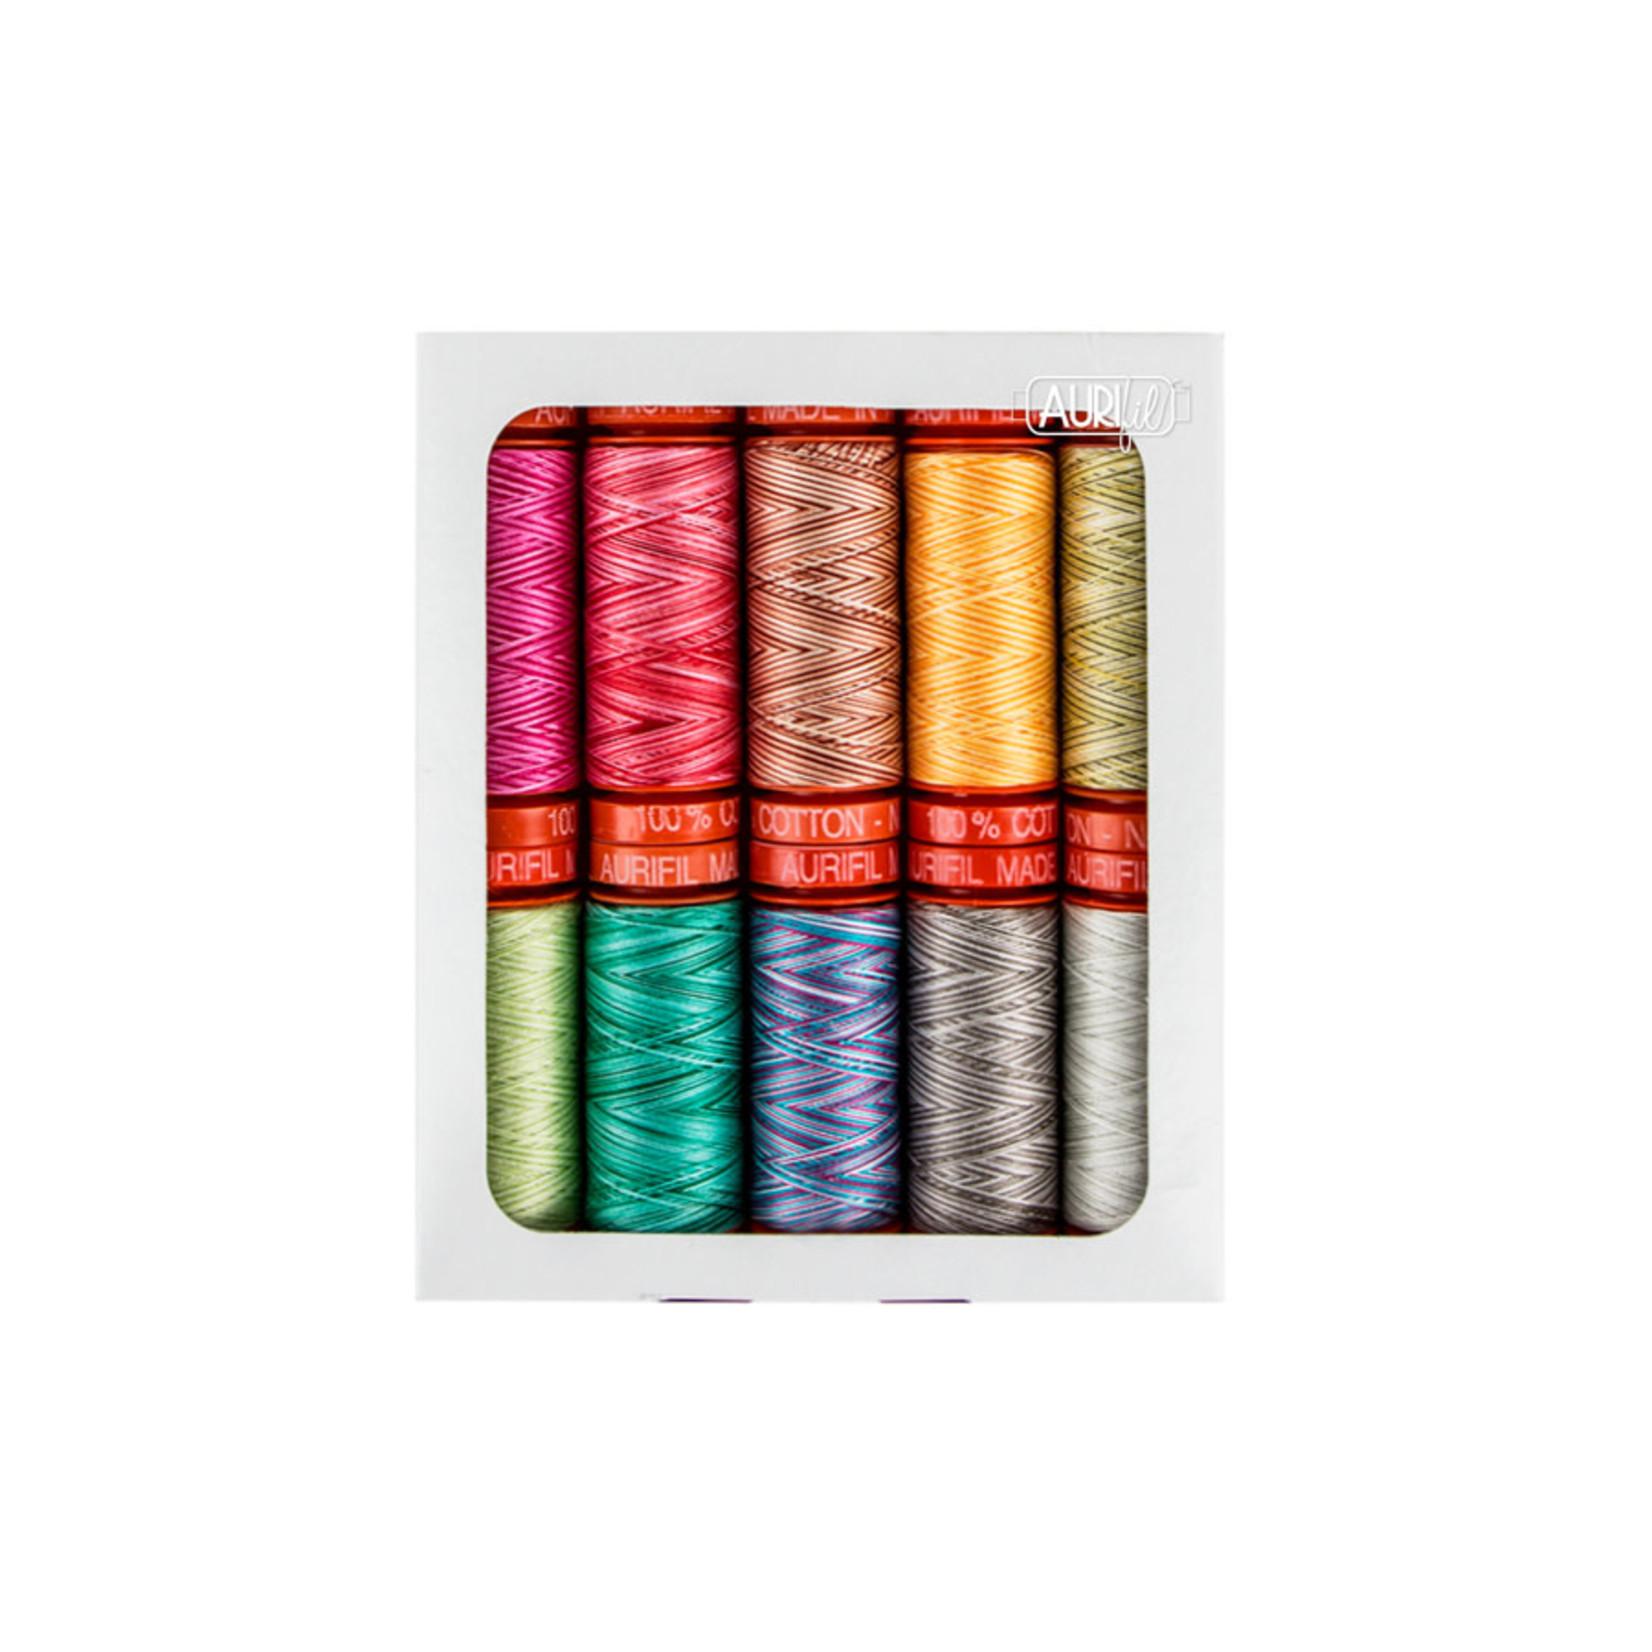 Tula Pink Tula Pink Premium Small Spool Thread Collection